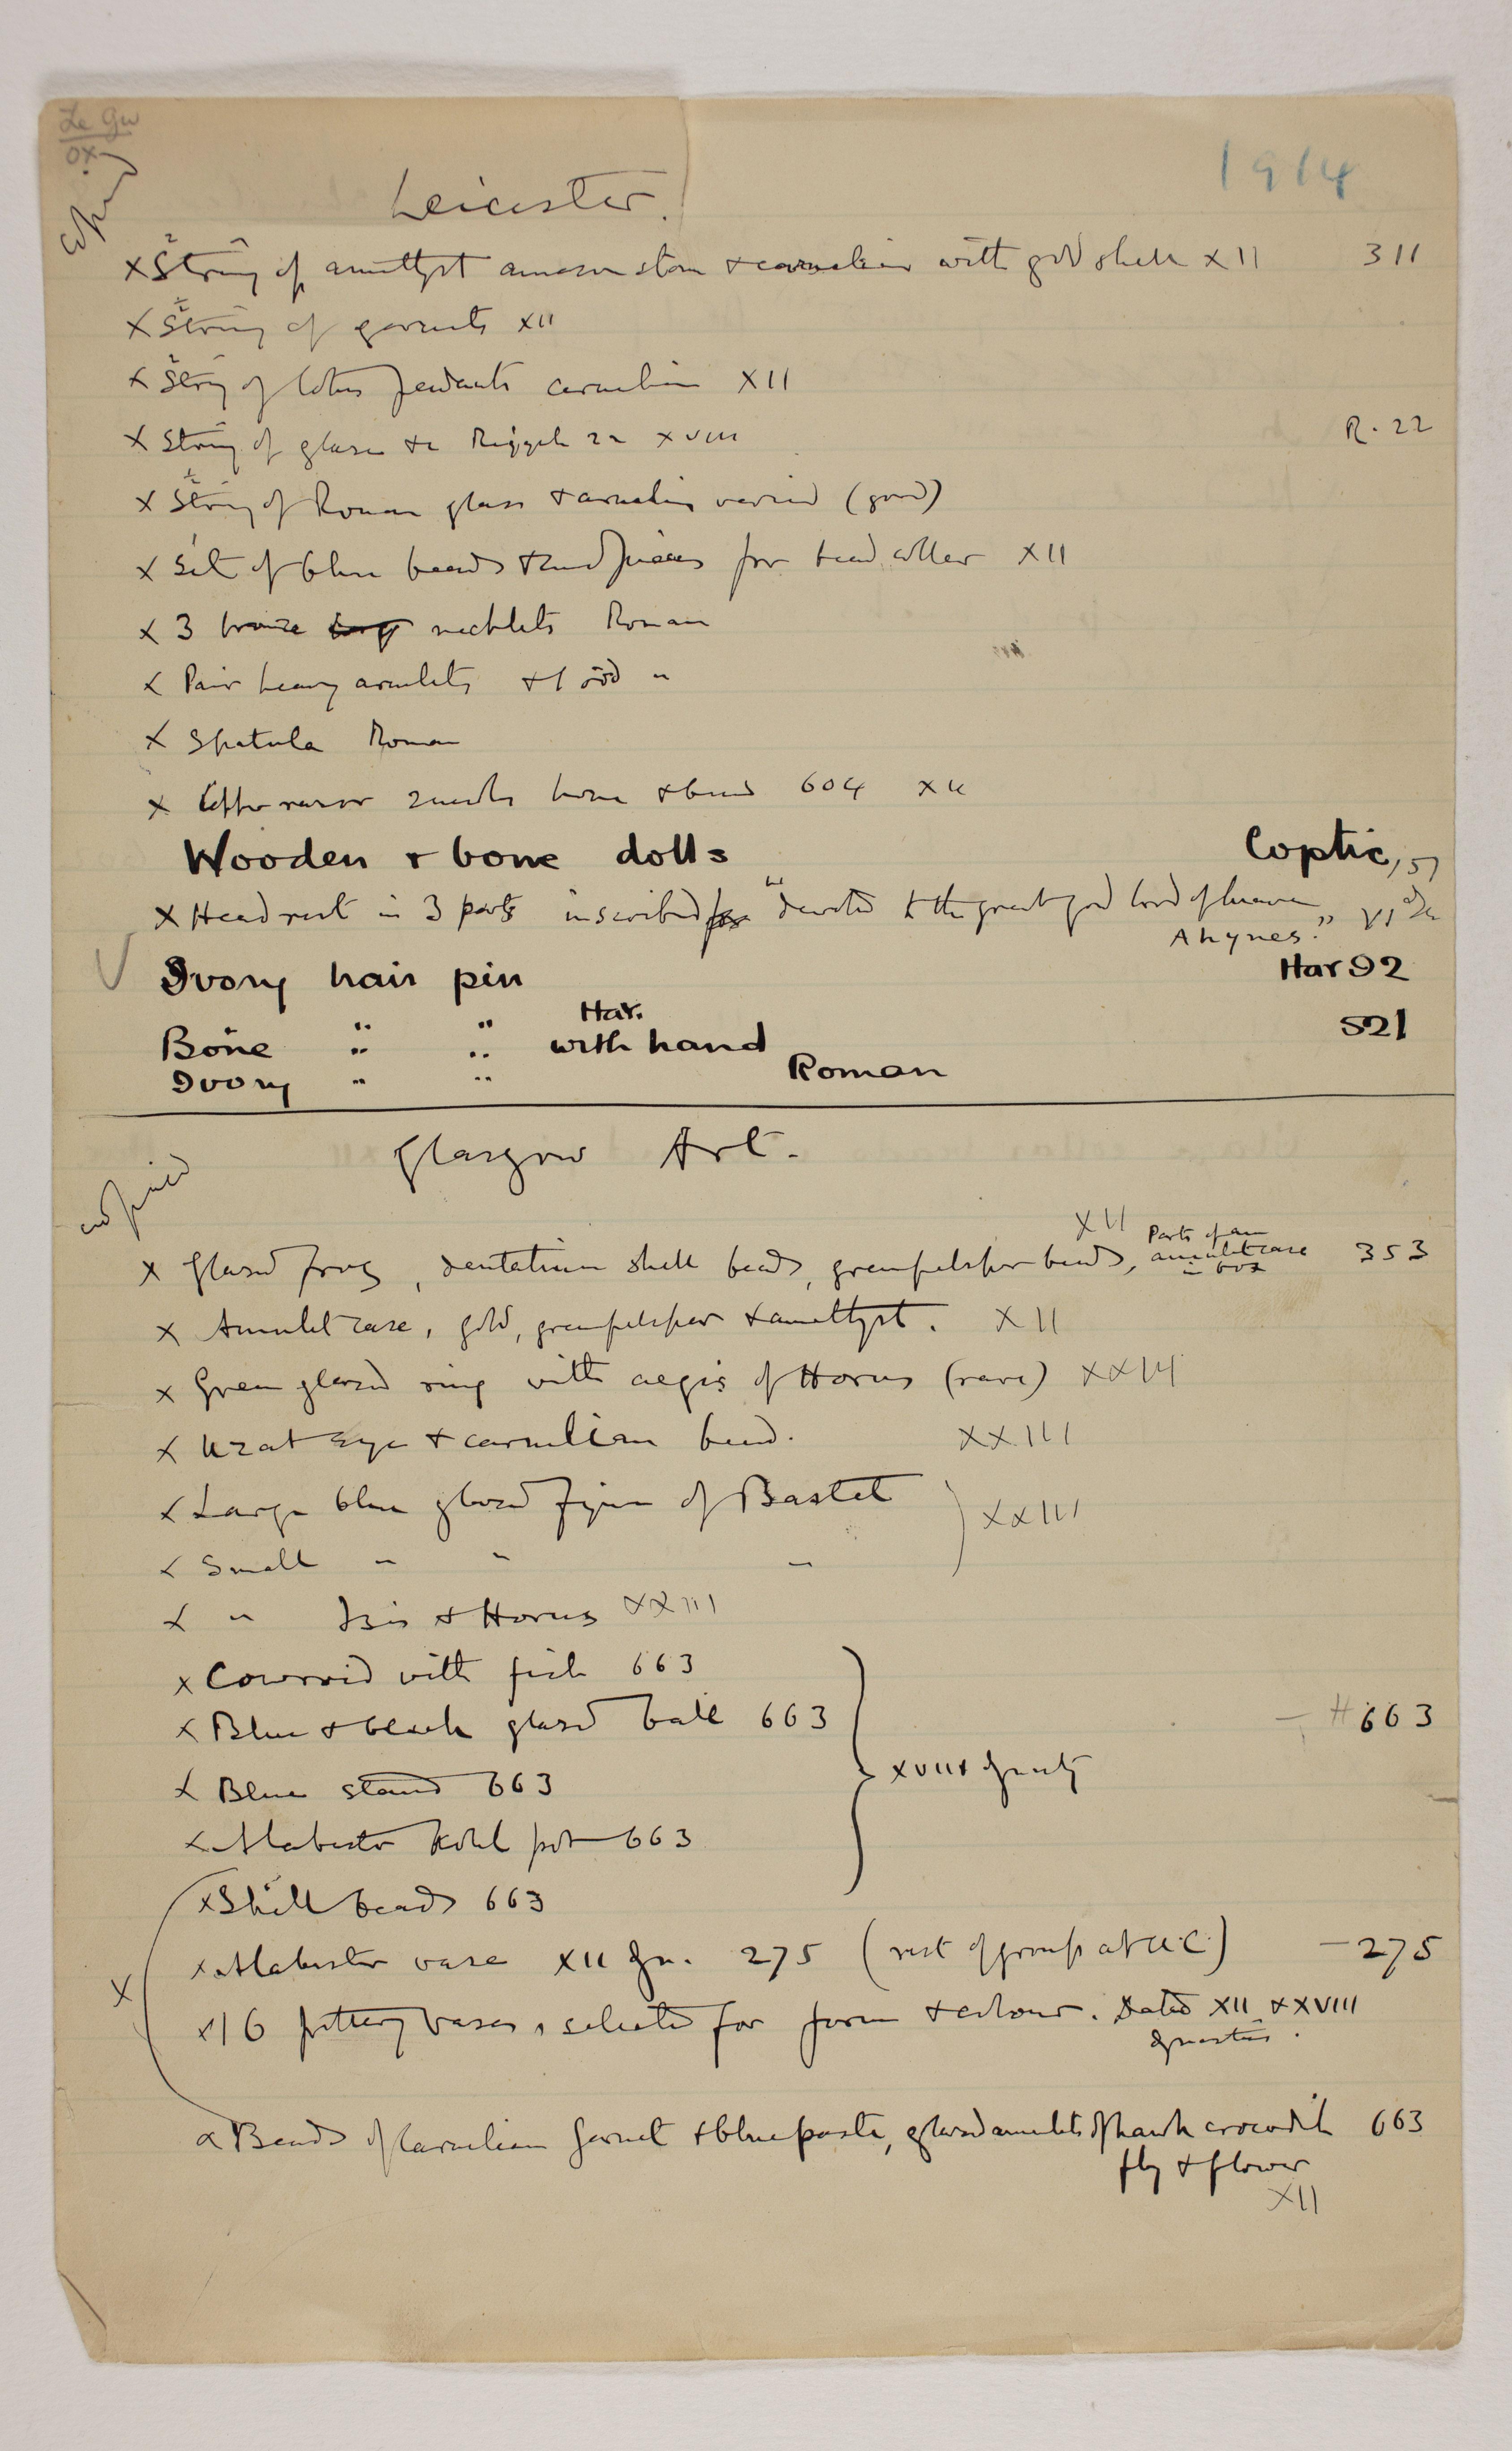 1913-14 Lahun, Haraga Individual institution list  PMA/WFP1/D/22/45.2